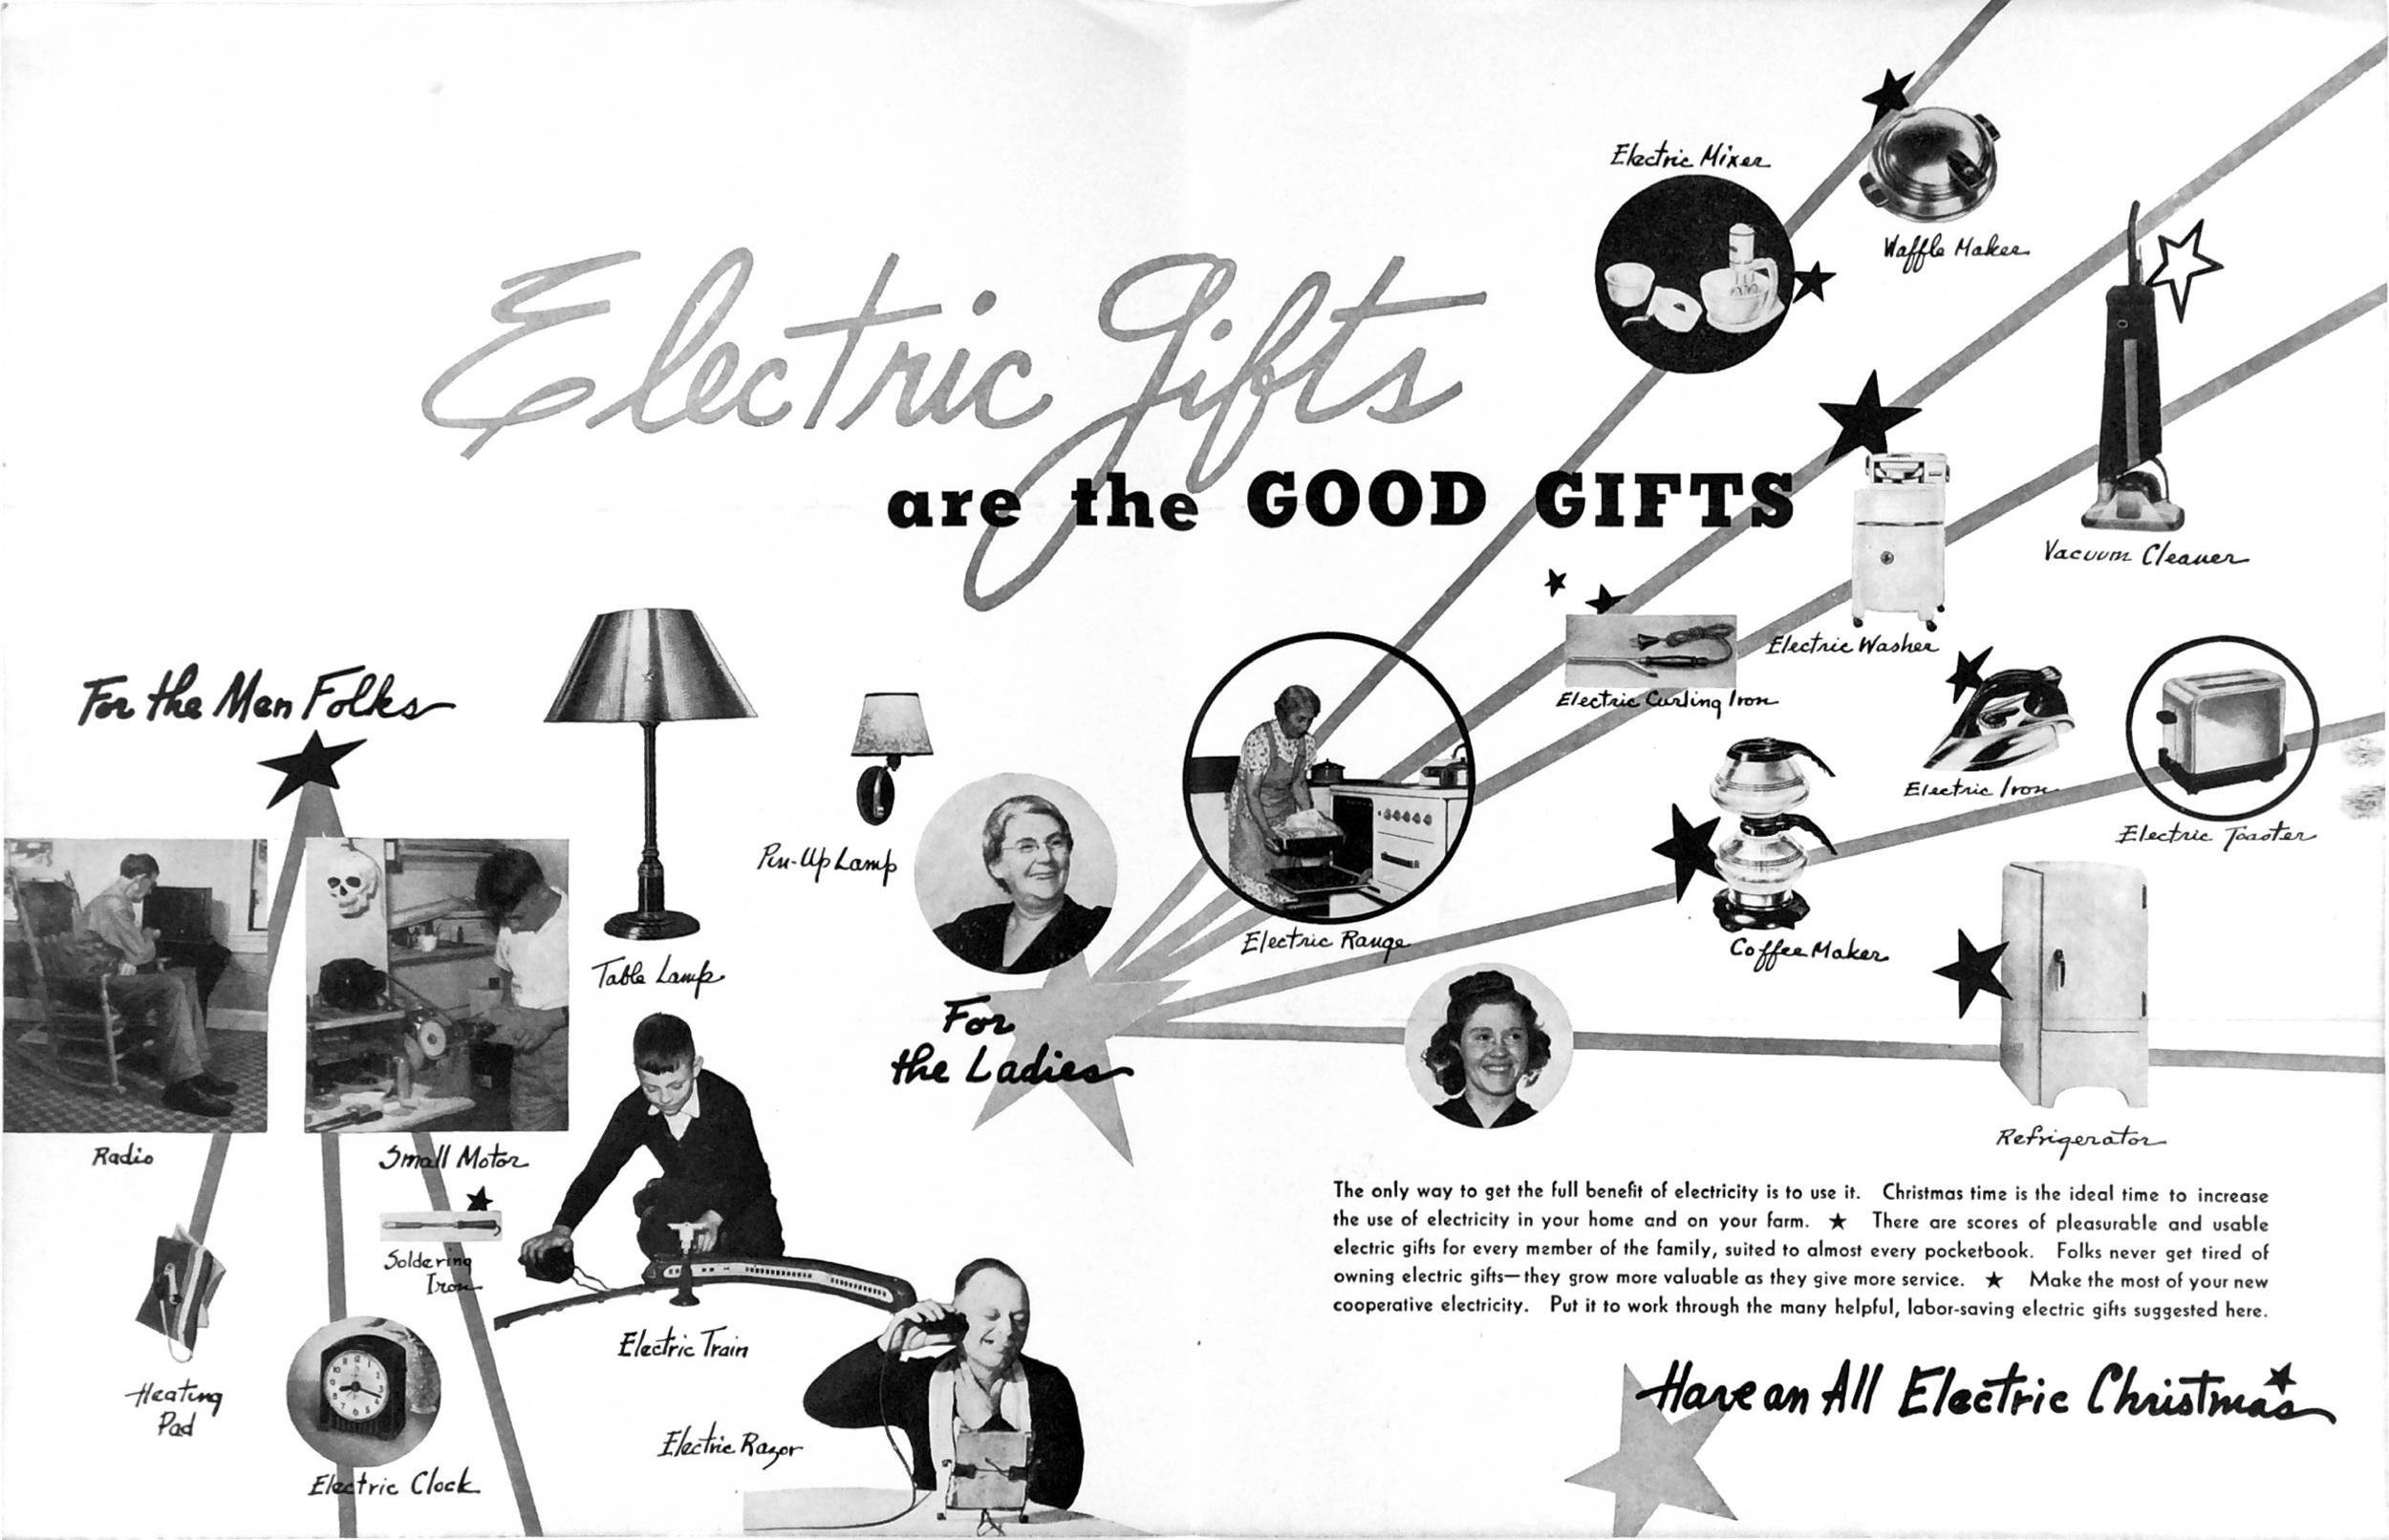 Christmas Insert, Rural Electrification News, December 1940